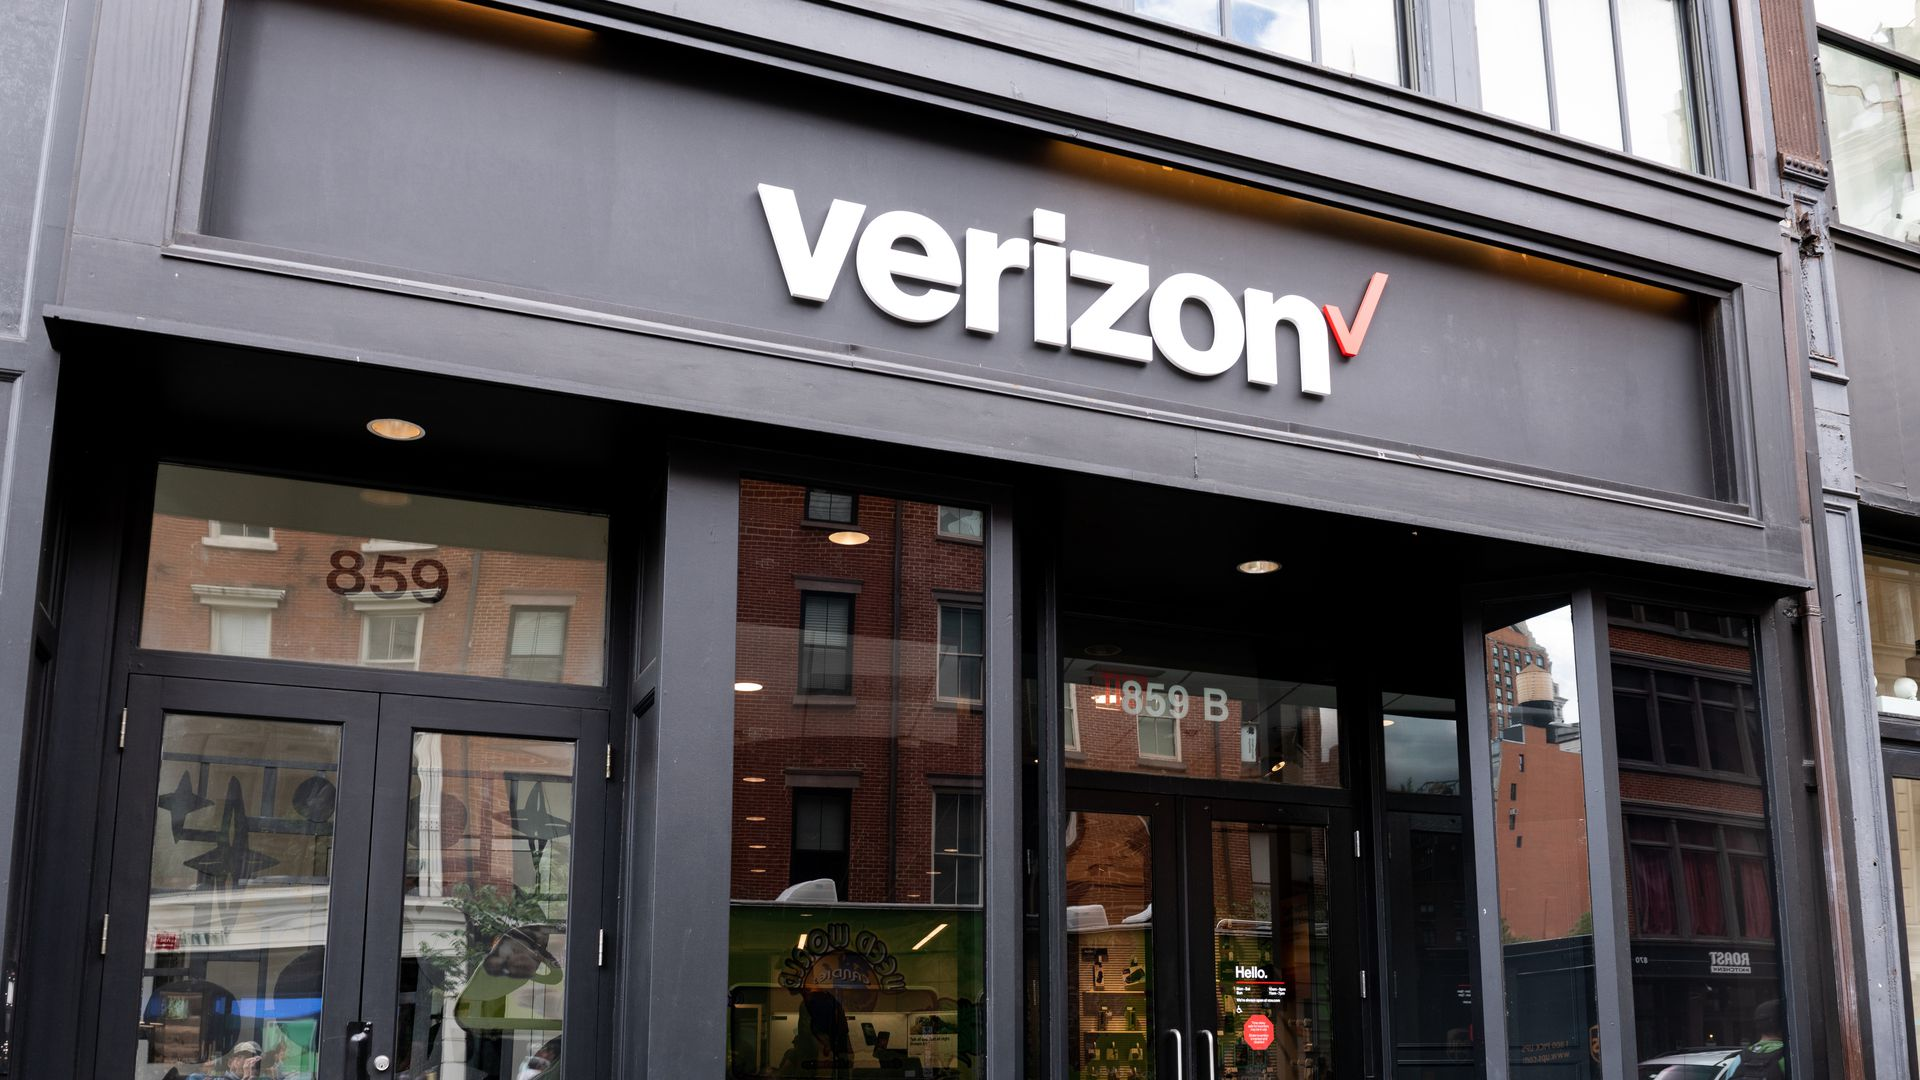 A Verizon store